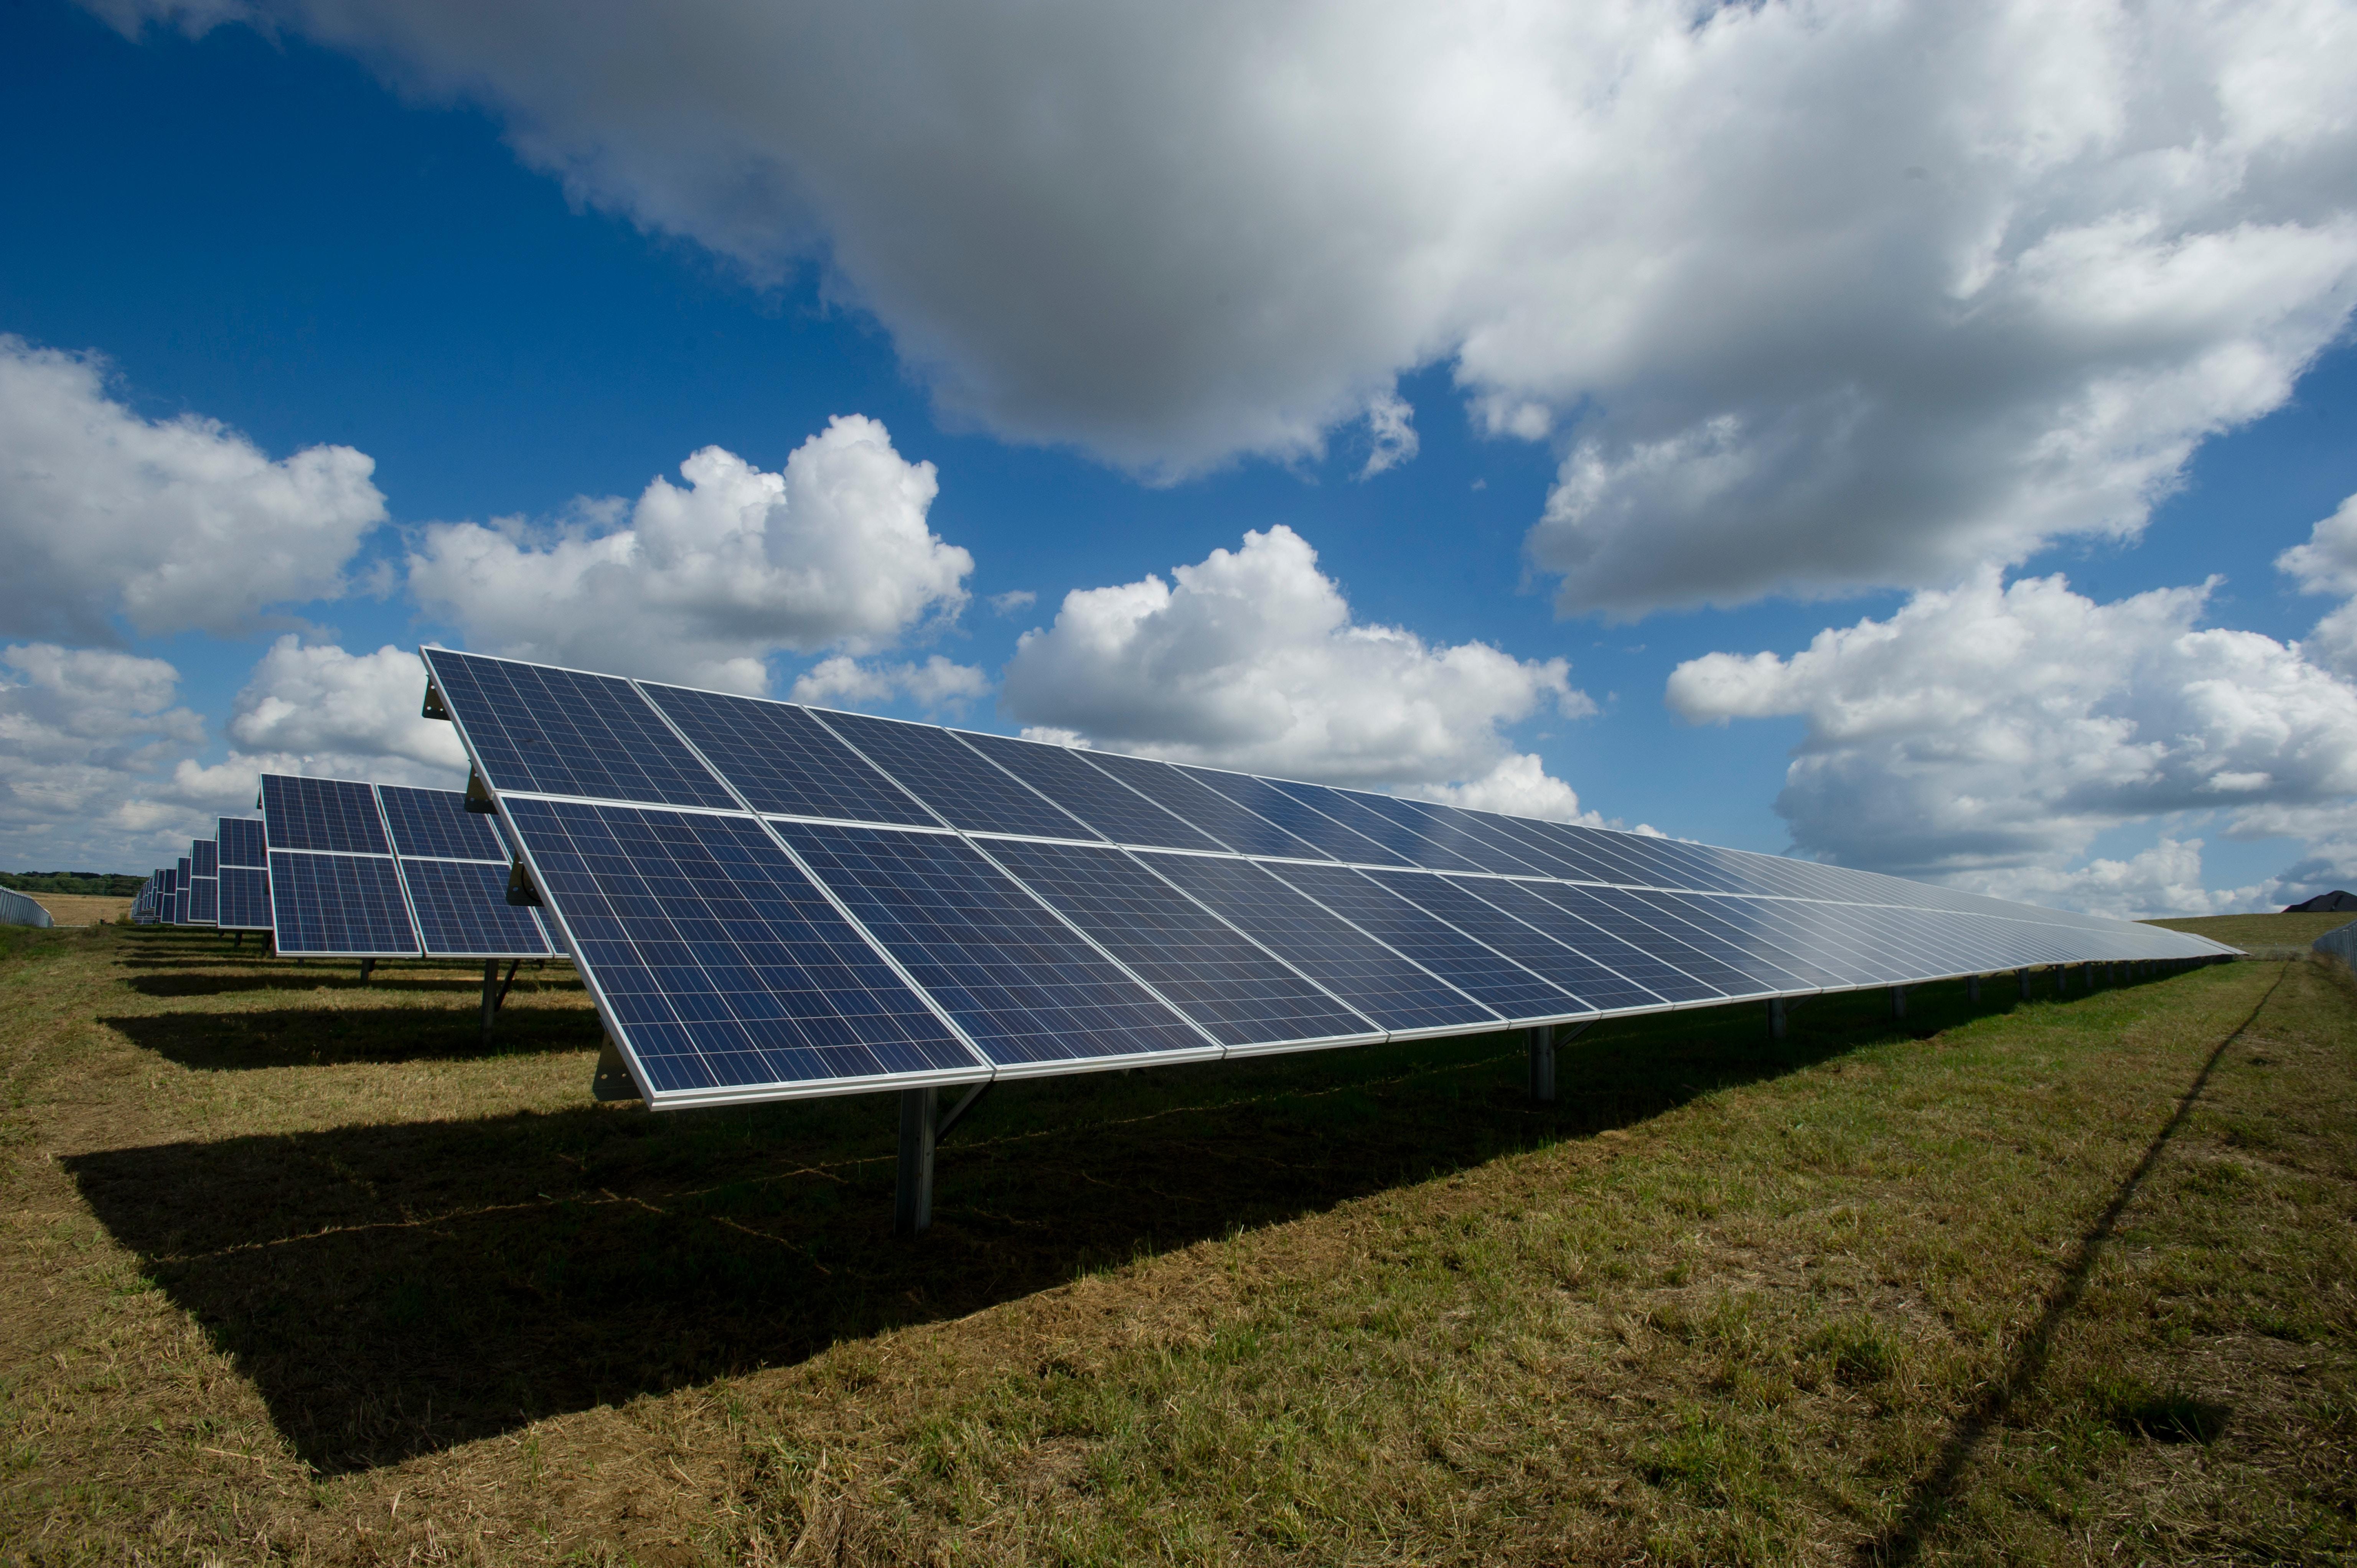 Solarfocus Sunnyline Solar Panels